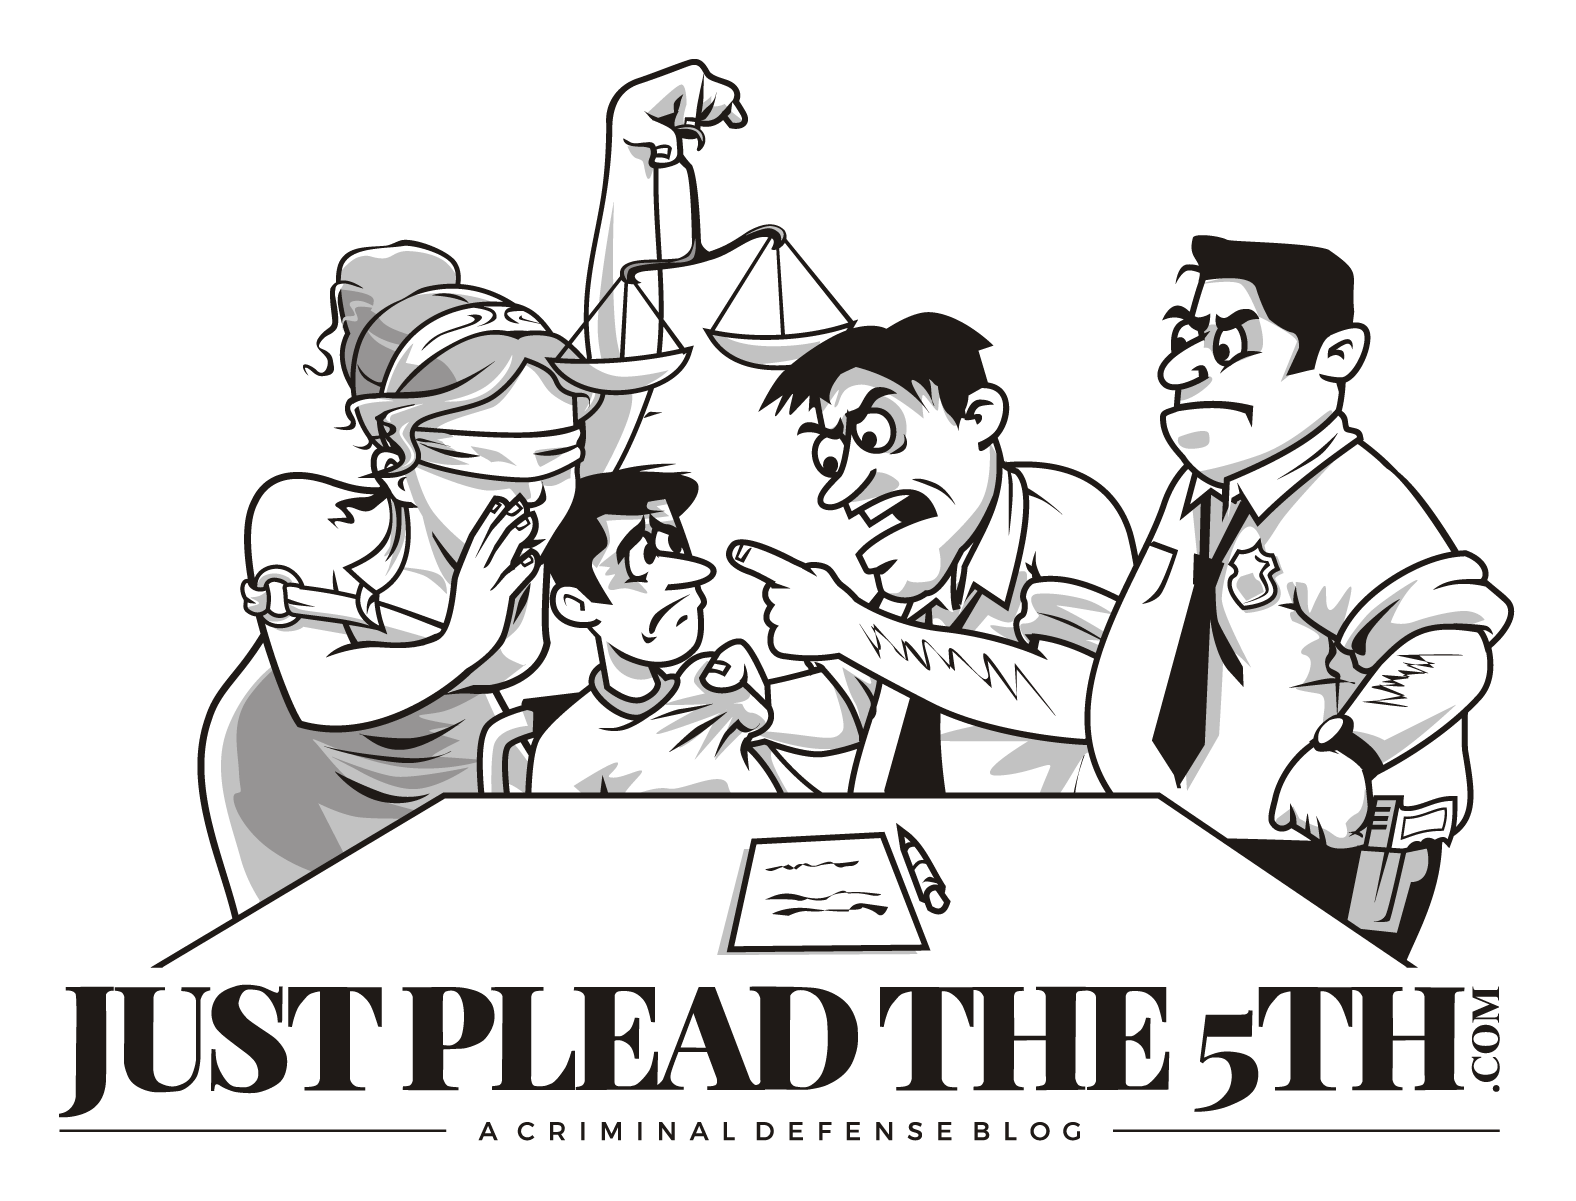 Design a classy, but fun logo for JustPleadThe5th.com